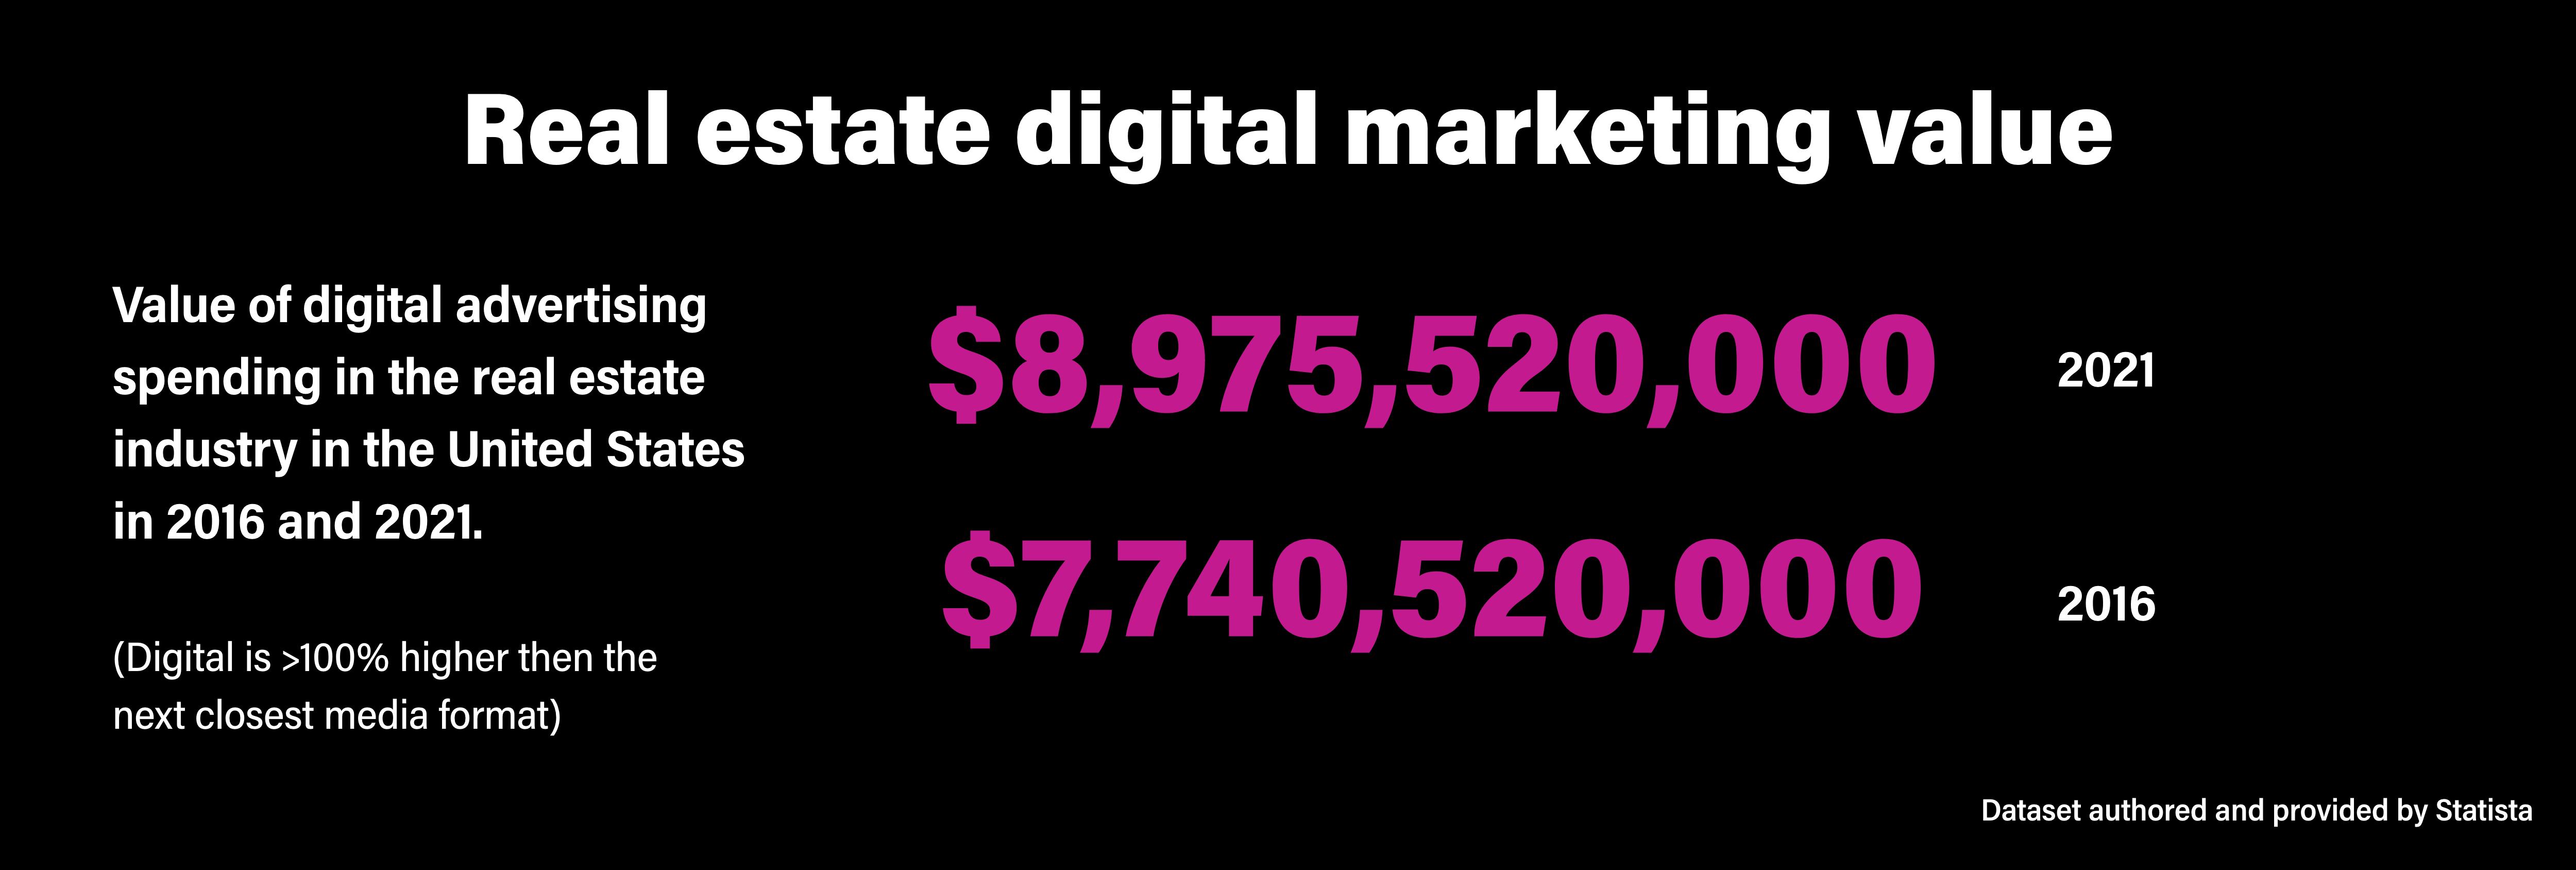 Real estate digital marketing value